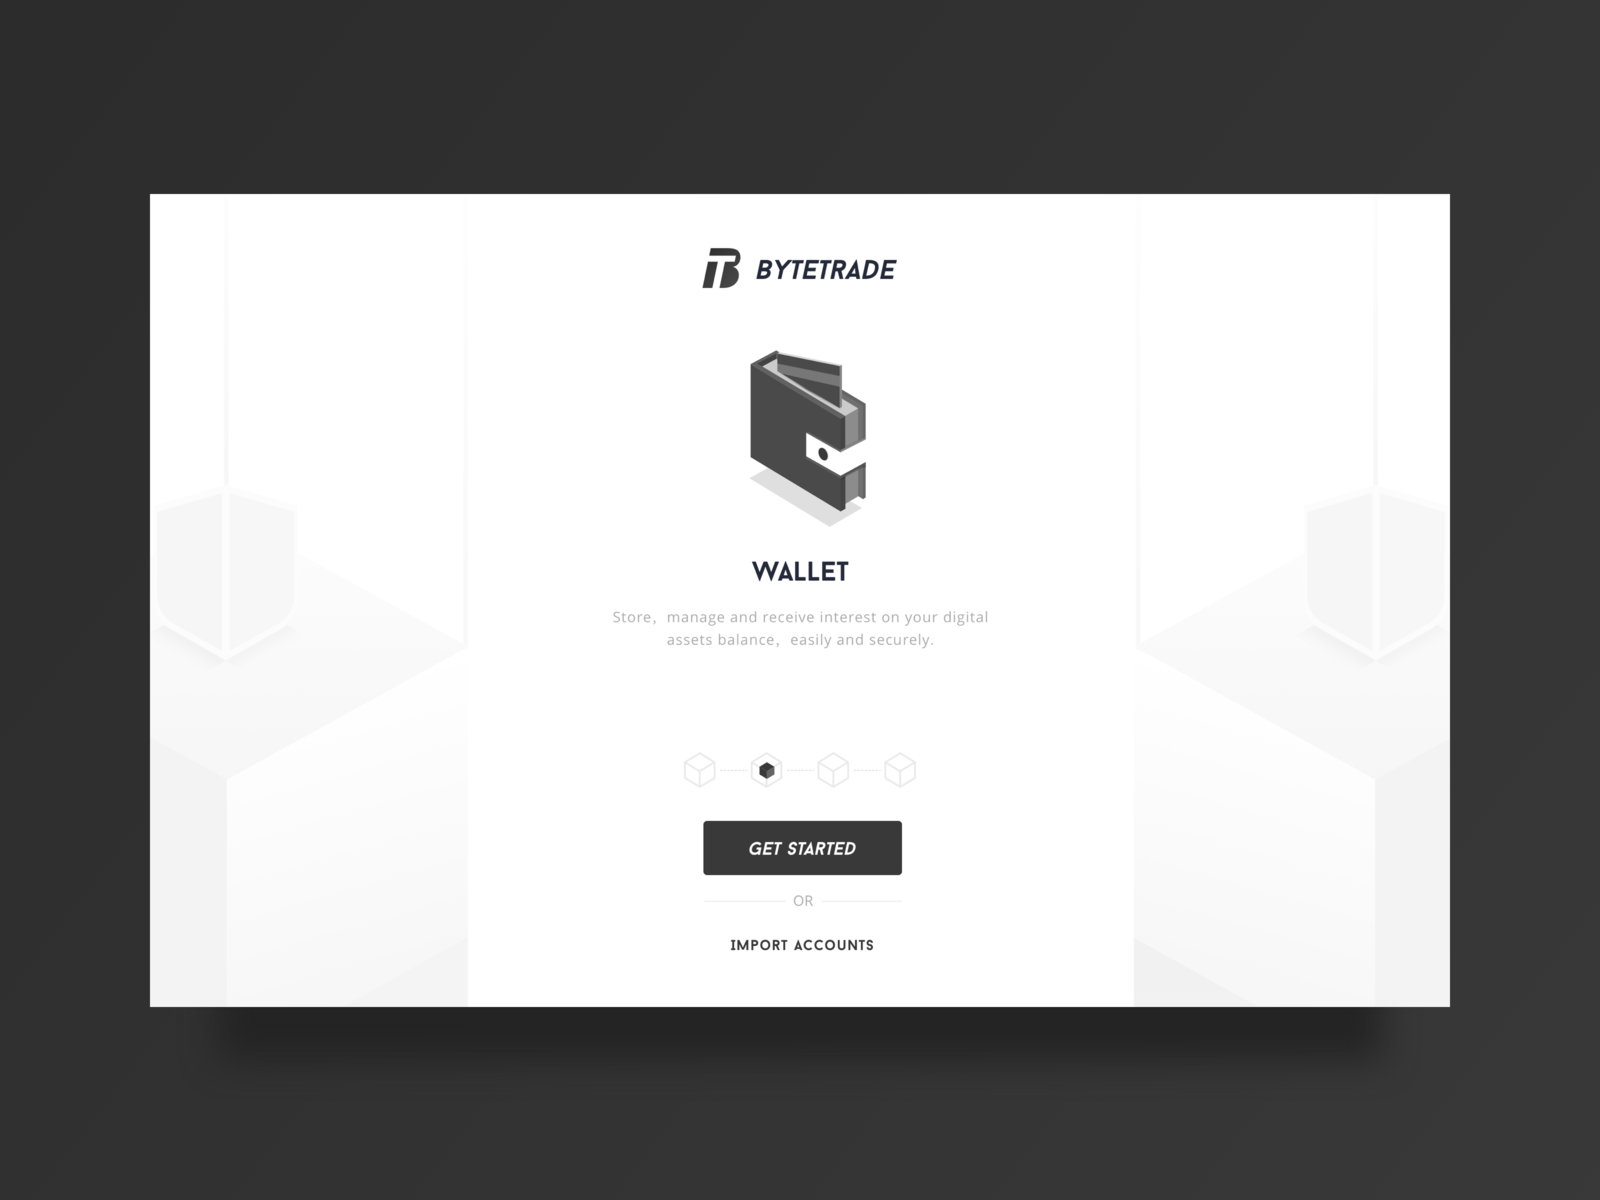 Bytetrade Web Guide Page Web Design Page Design Creative Professional